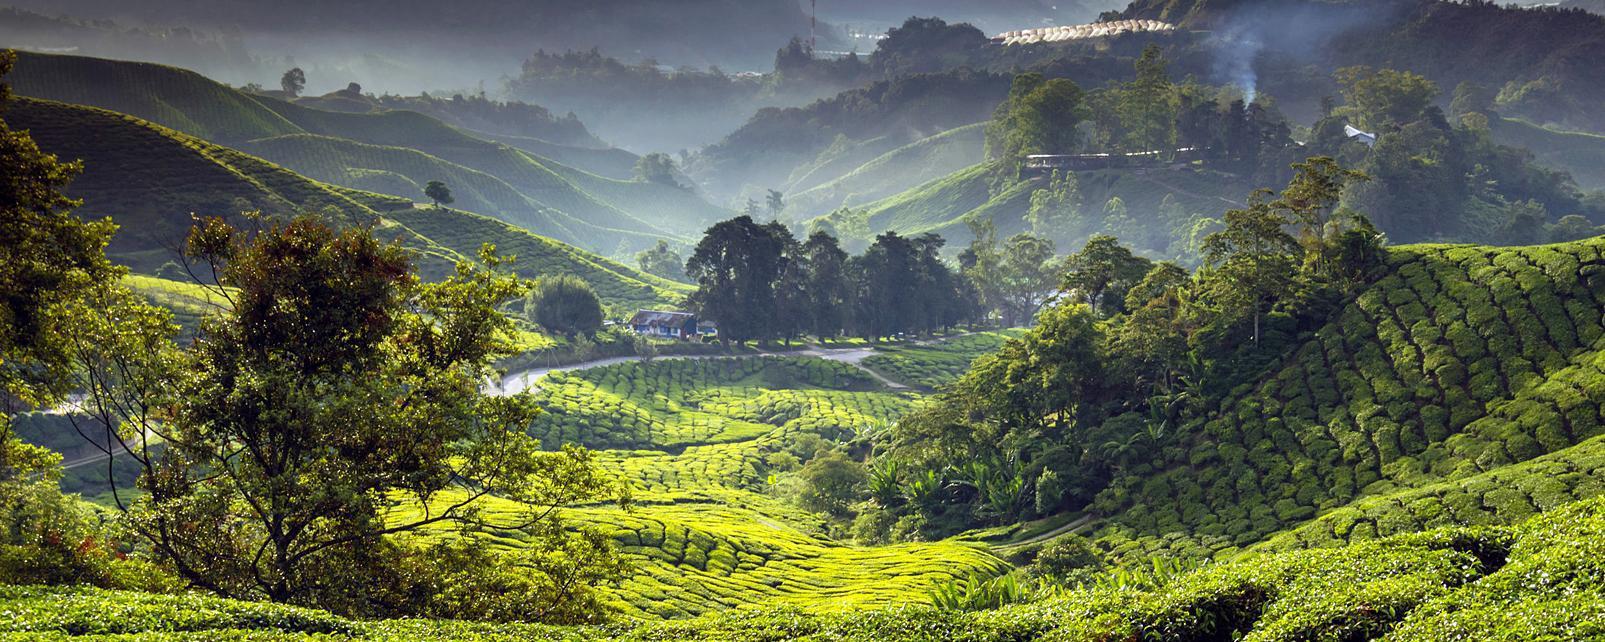 Asie, Malaisie, Cameron Highlands, plantation, thé, montagne,